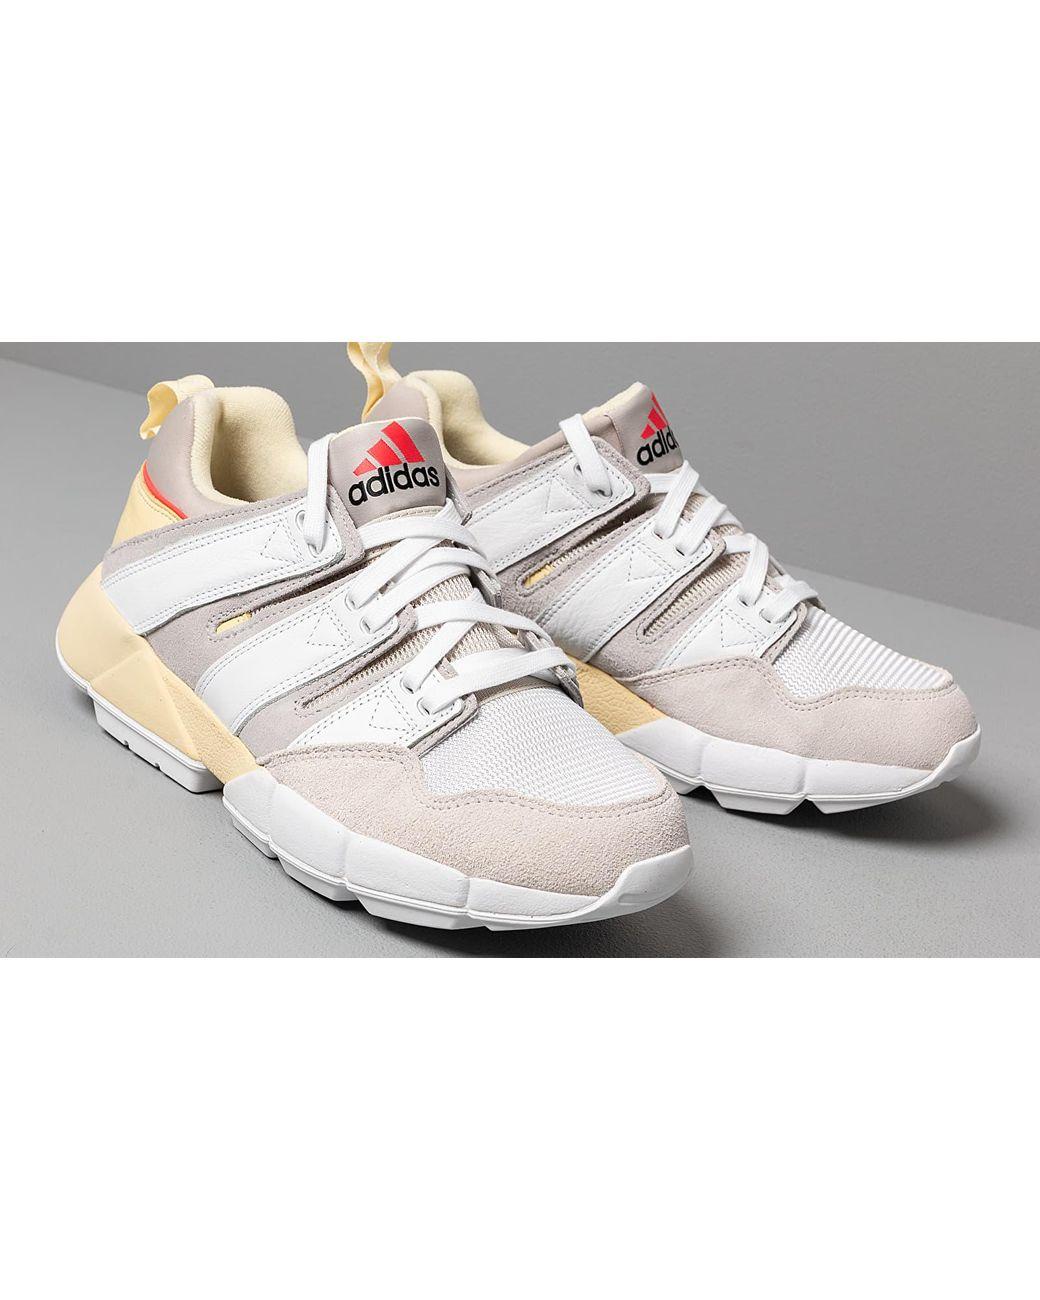 Adidas Gazelle « Sneaker outlet « Vycsas